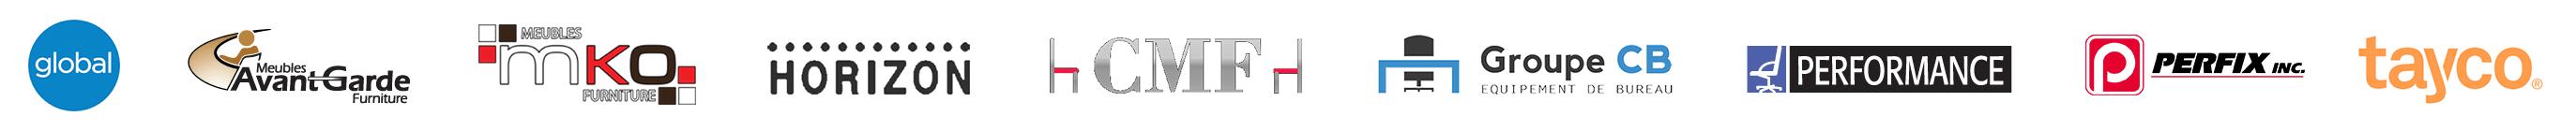 Logos fournisseurs Bureau Plan